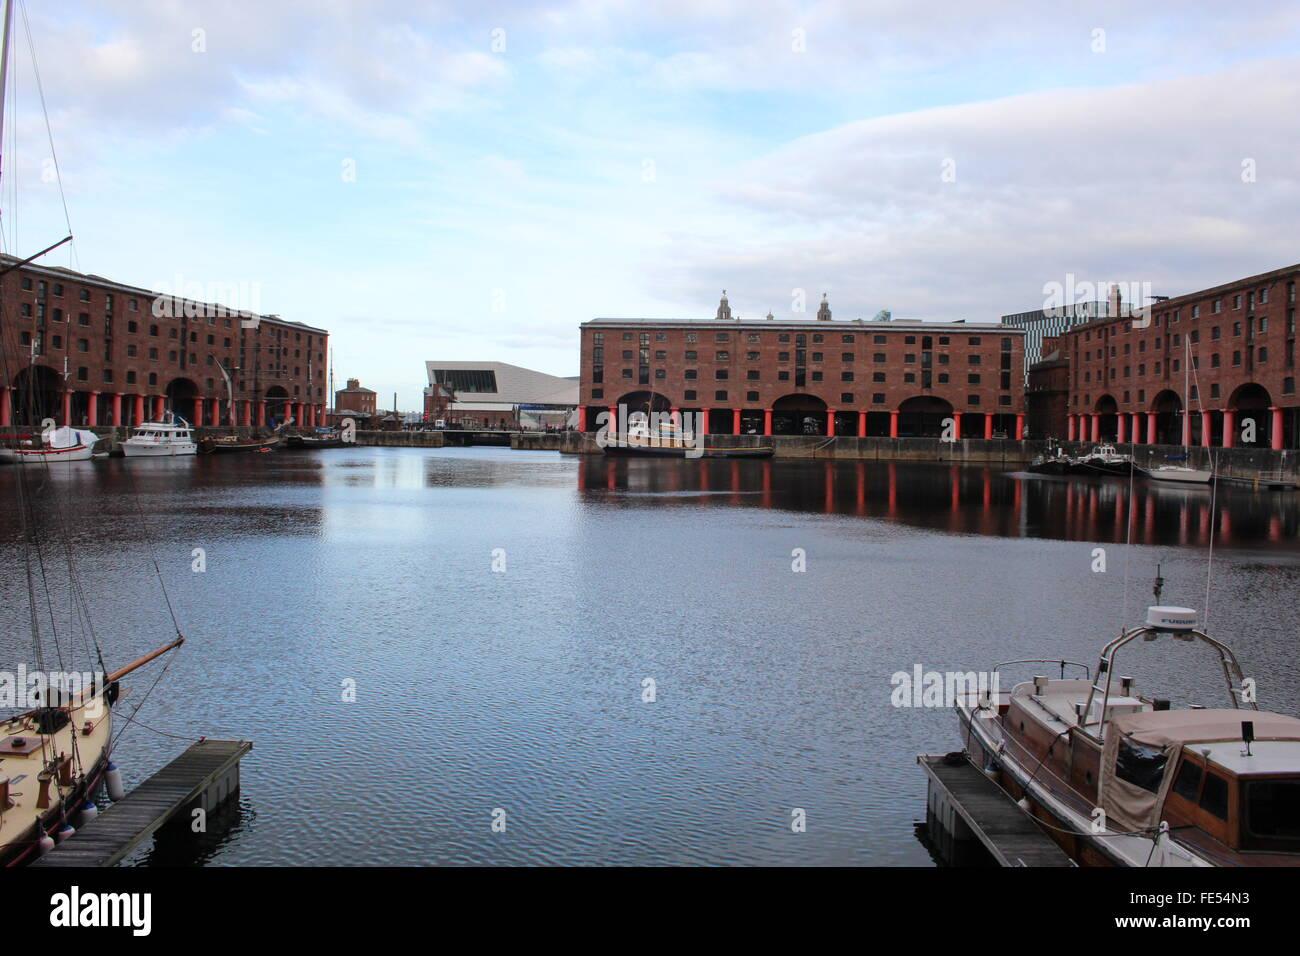 Liverpool Albert docks red bricks port water wood boats submarine Ballards marina - Stock Image